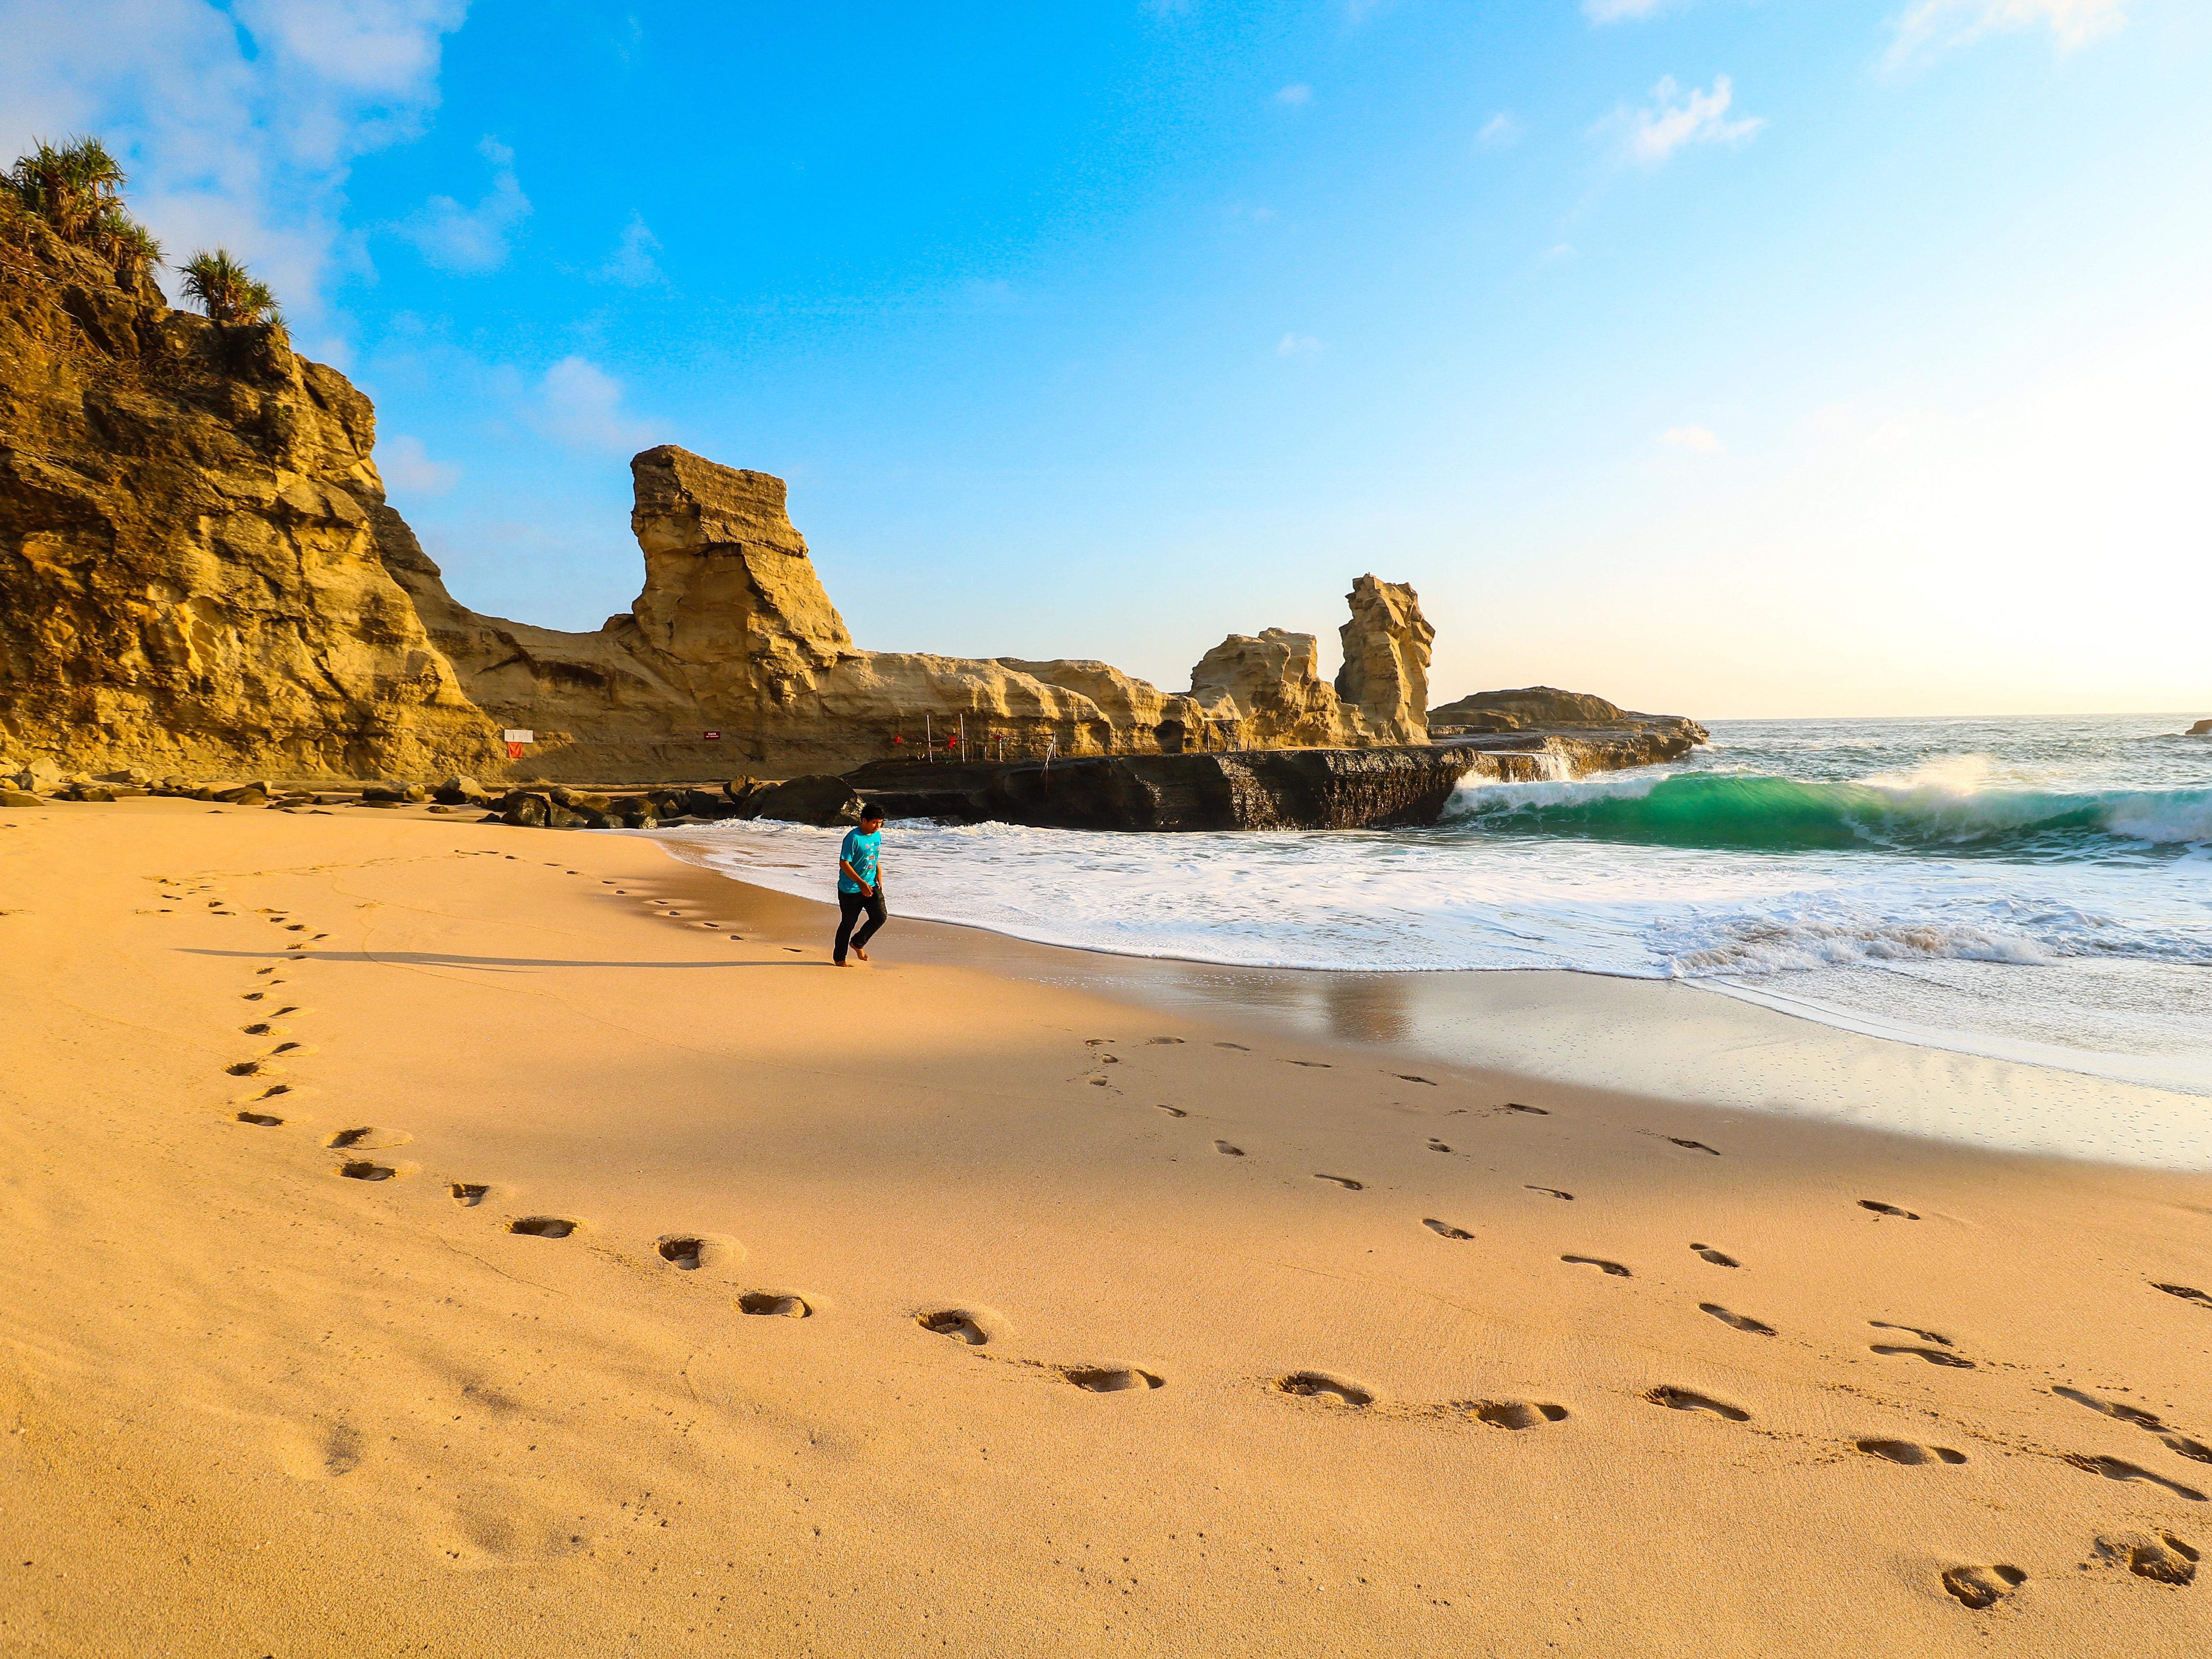 Person Walks on Brown Seashore Near Rock Formations, Beach, Scenery, Water, Sunshine, HQ Photo